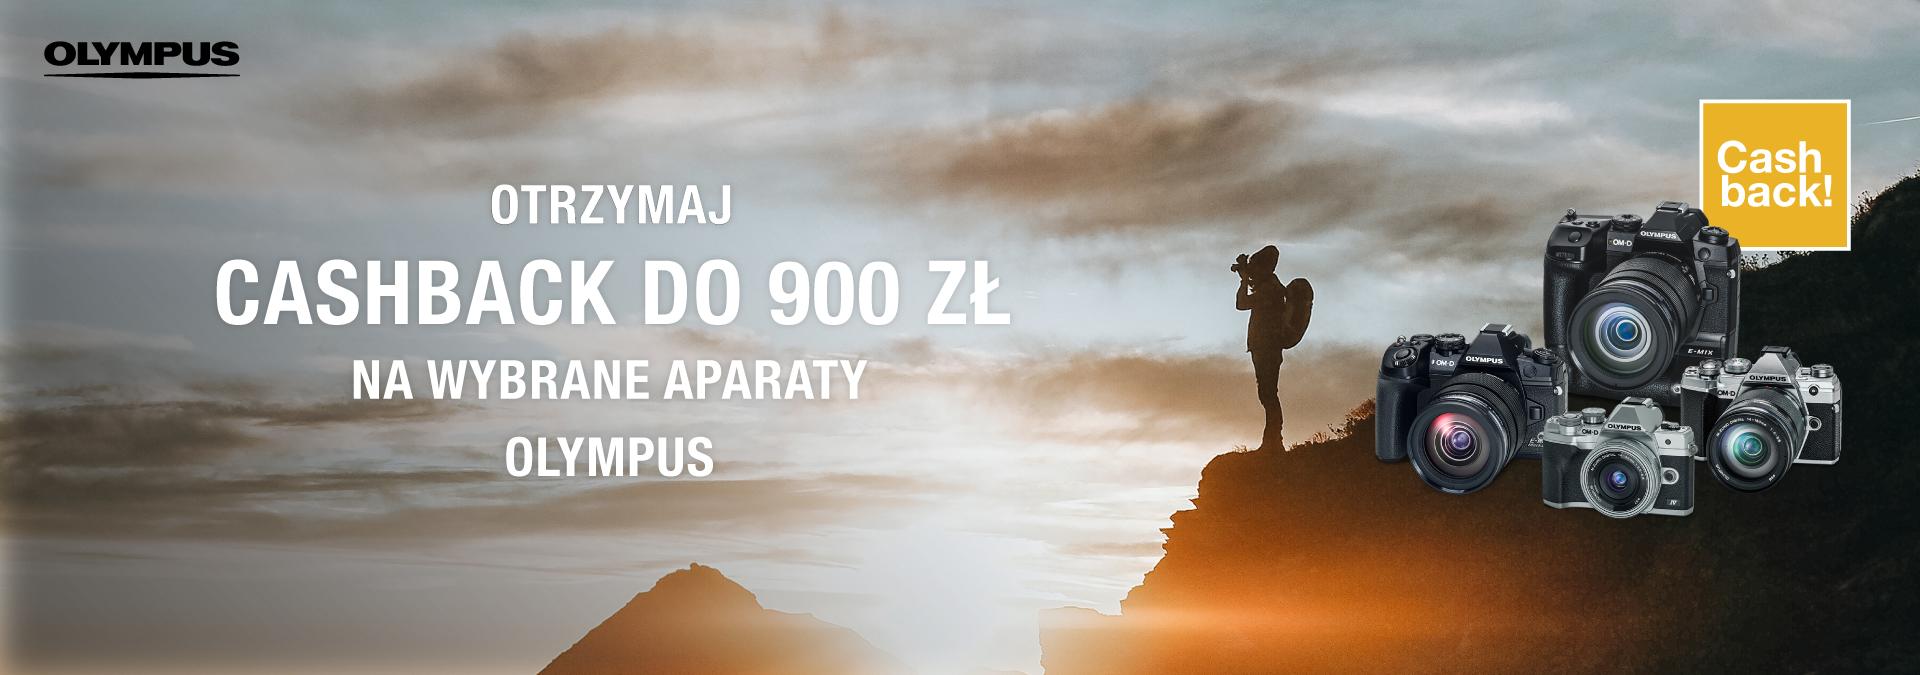 OLYMPUS CASHBACK DO 900ZŁ